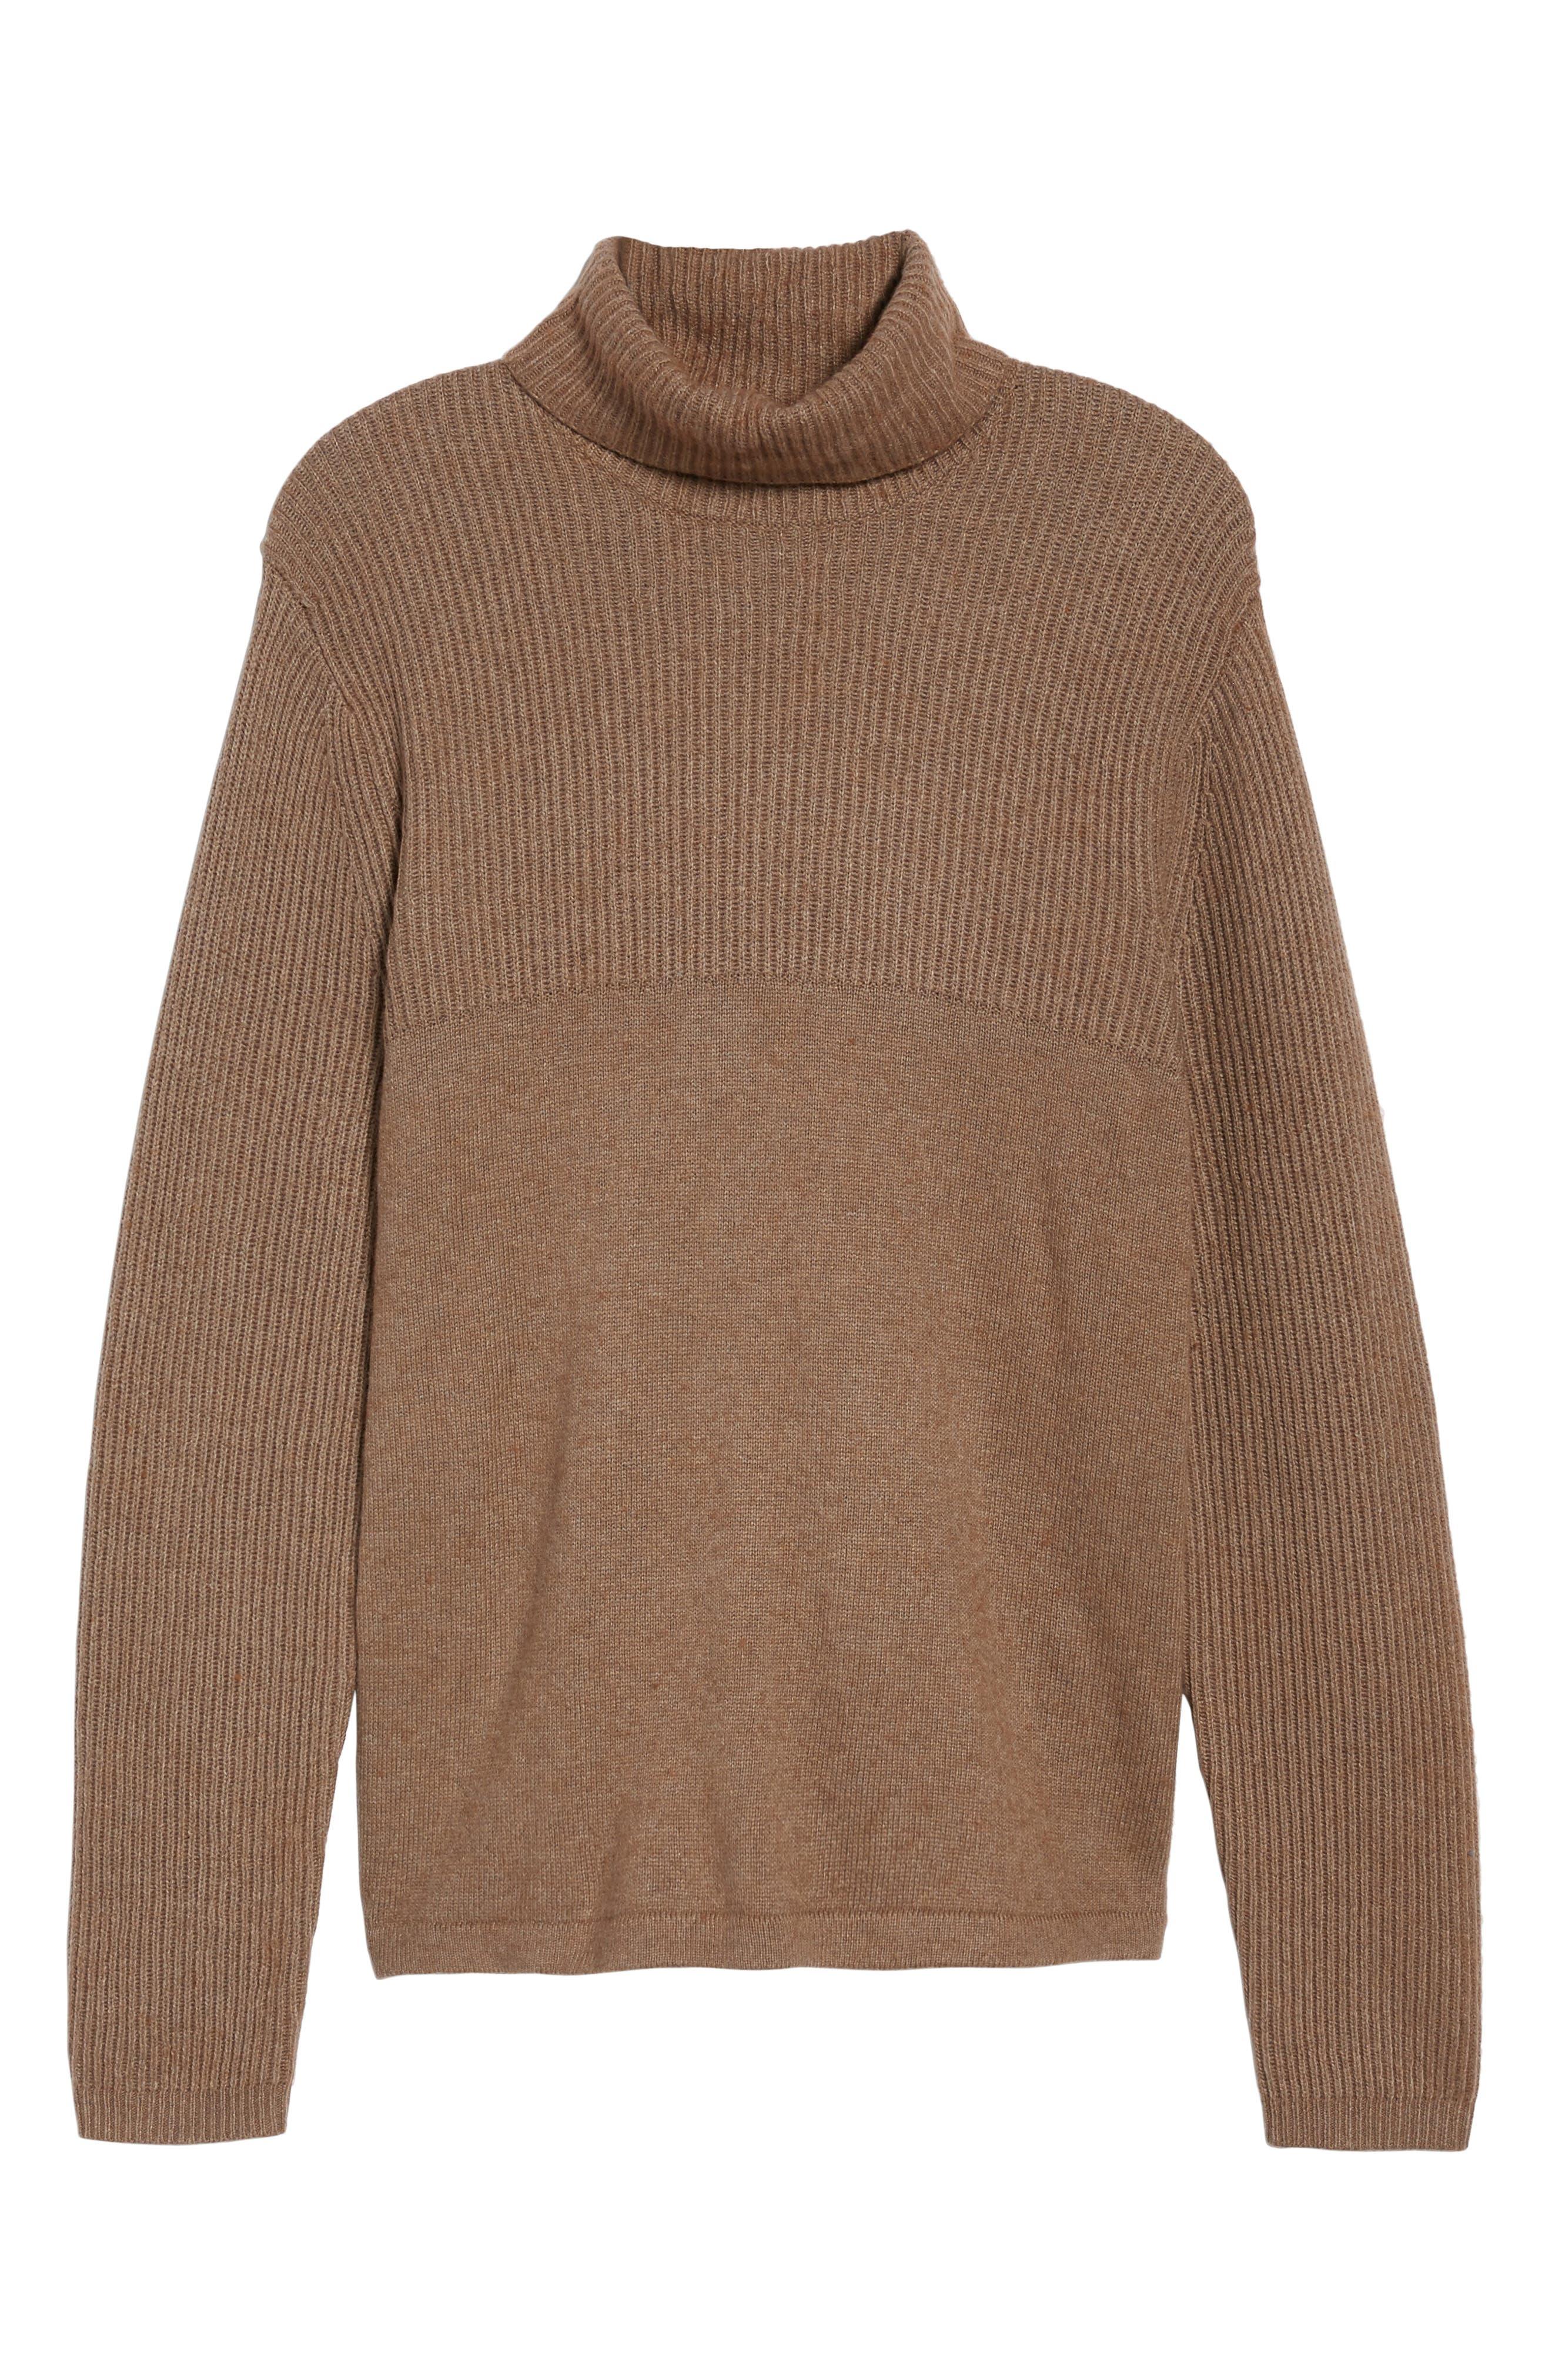 Mix Stitch Turtleneck Sweater,                             Alternate thumbnail 6, color,                             261